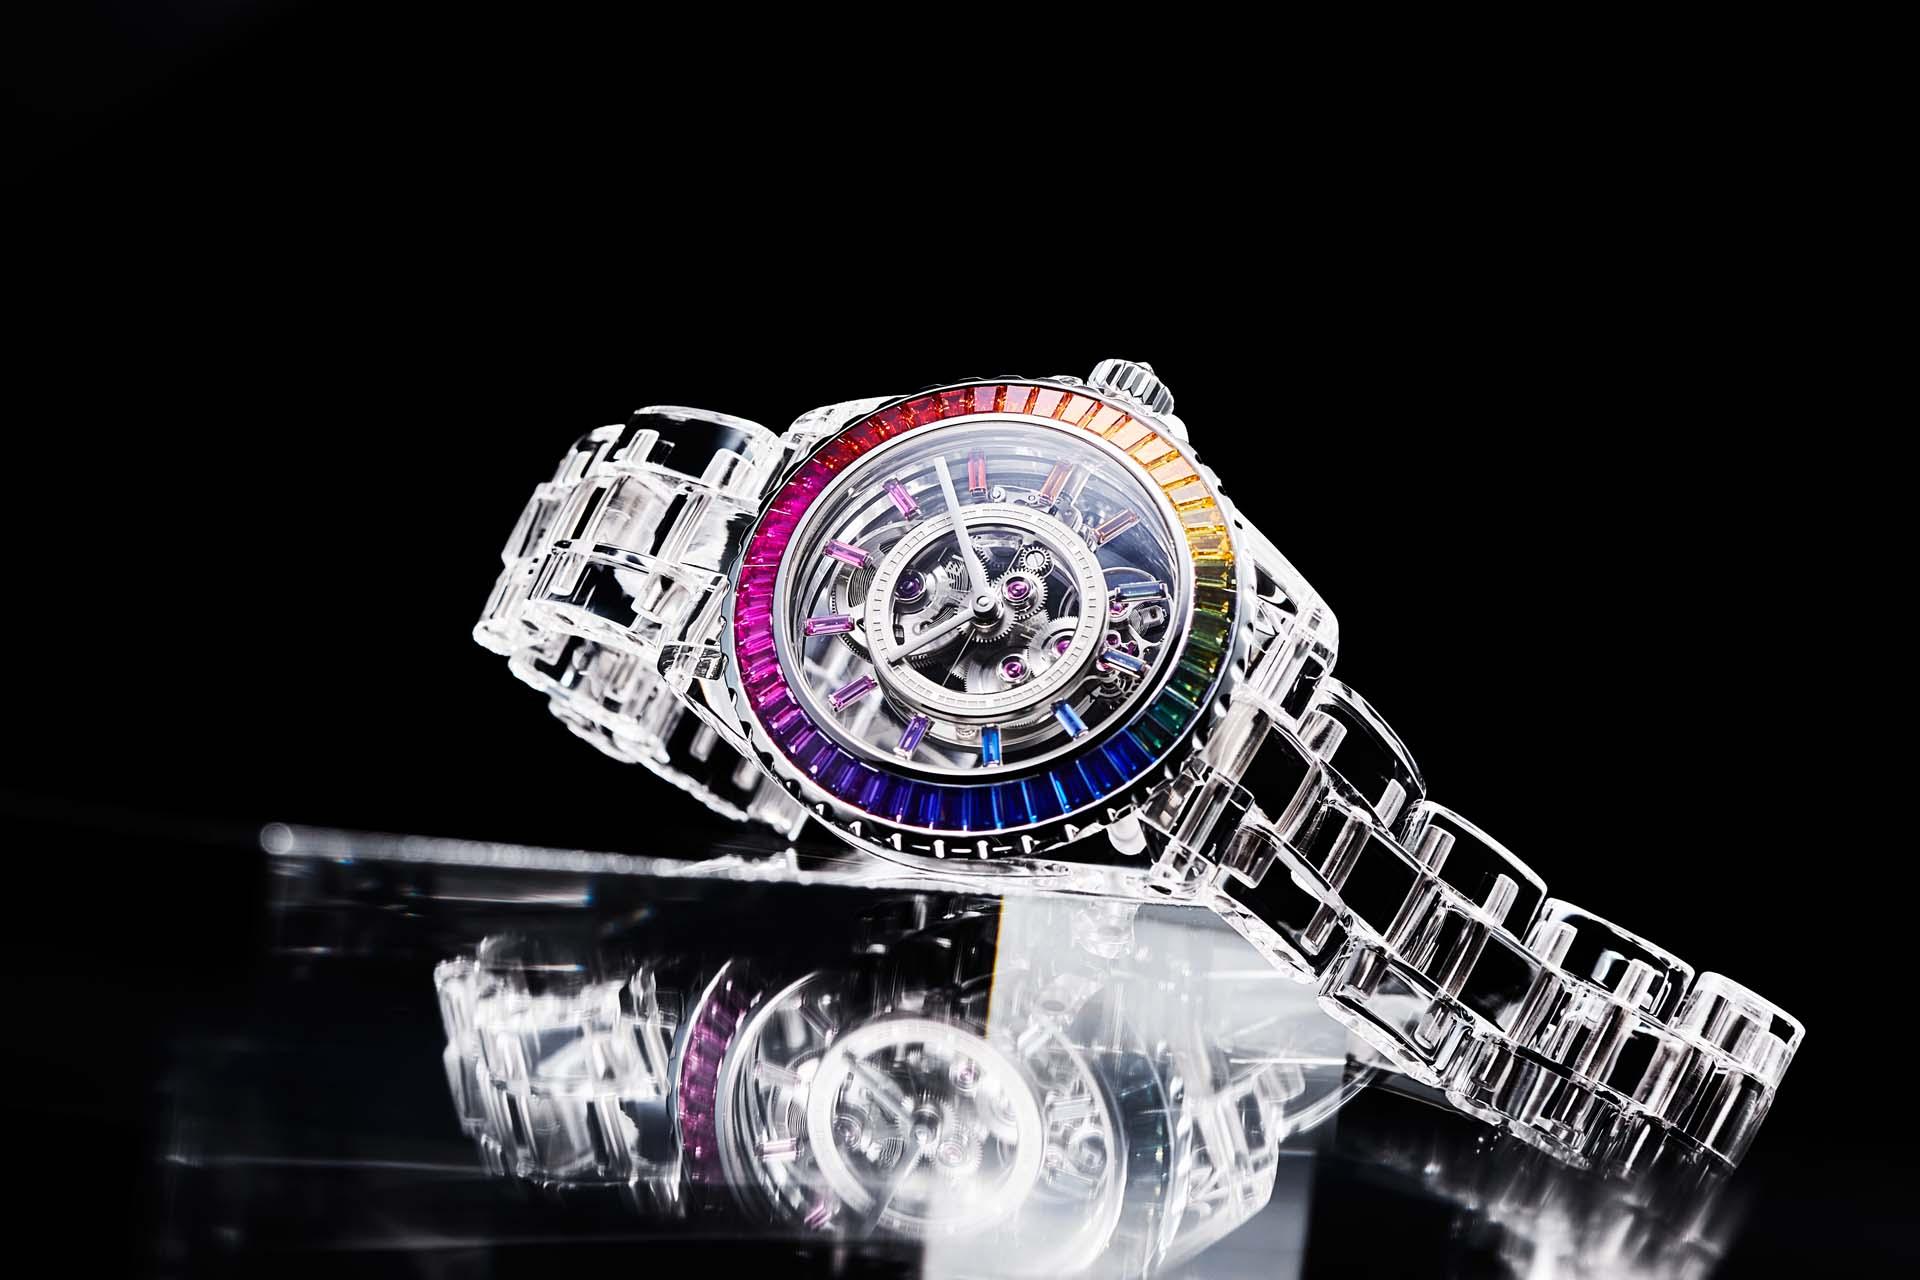 絢轉時光領潮流:J12 X-Ray Electro Caliber 3.1 腕錶